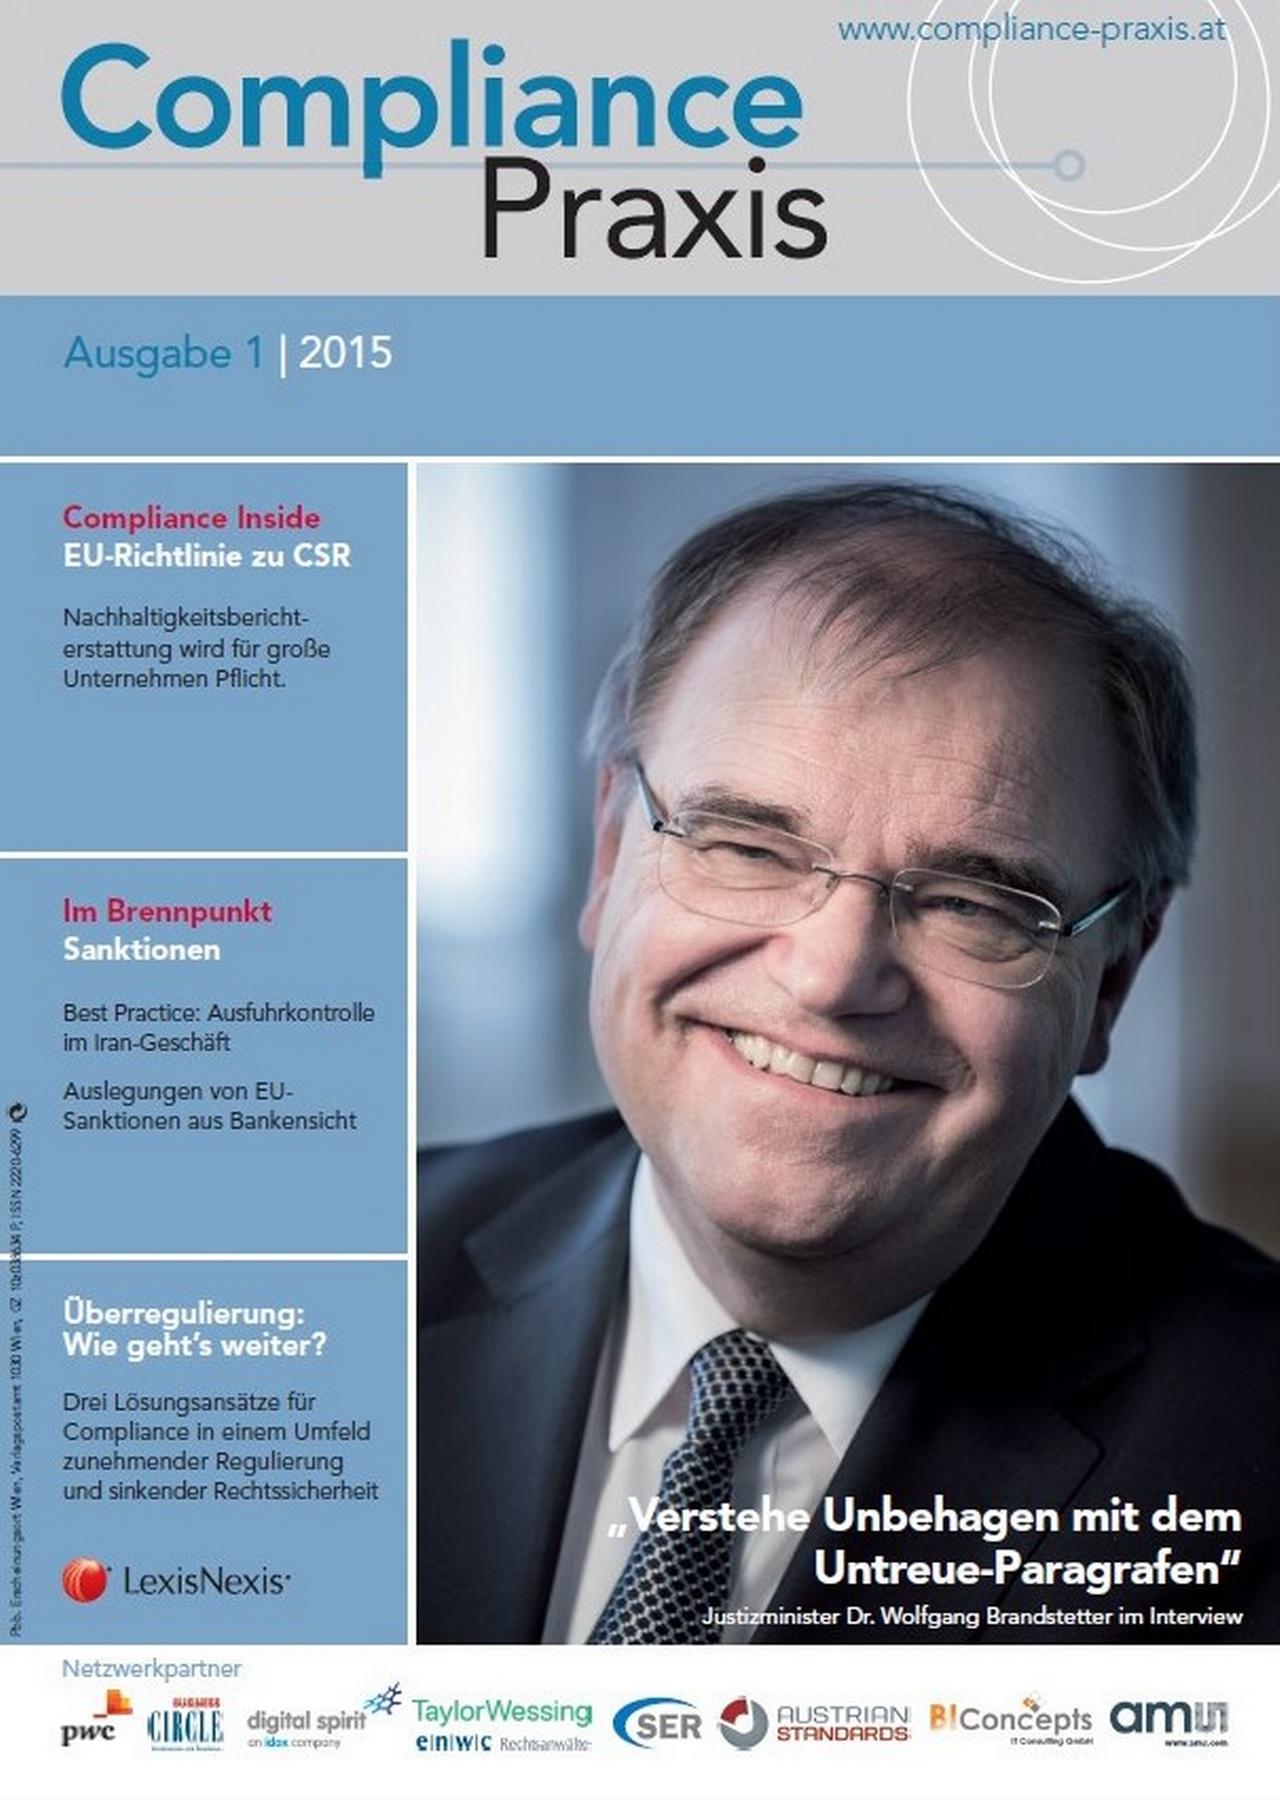 Cover von Compliance Praxis Ausgabe 1/2015, © LexisNexis